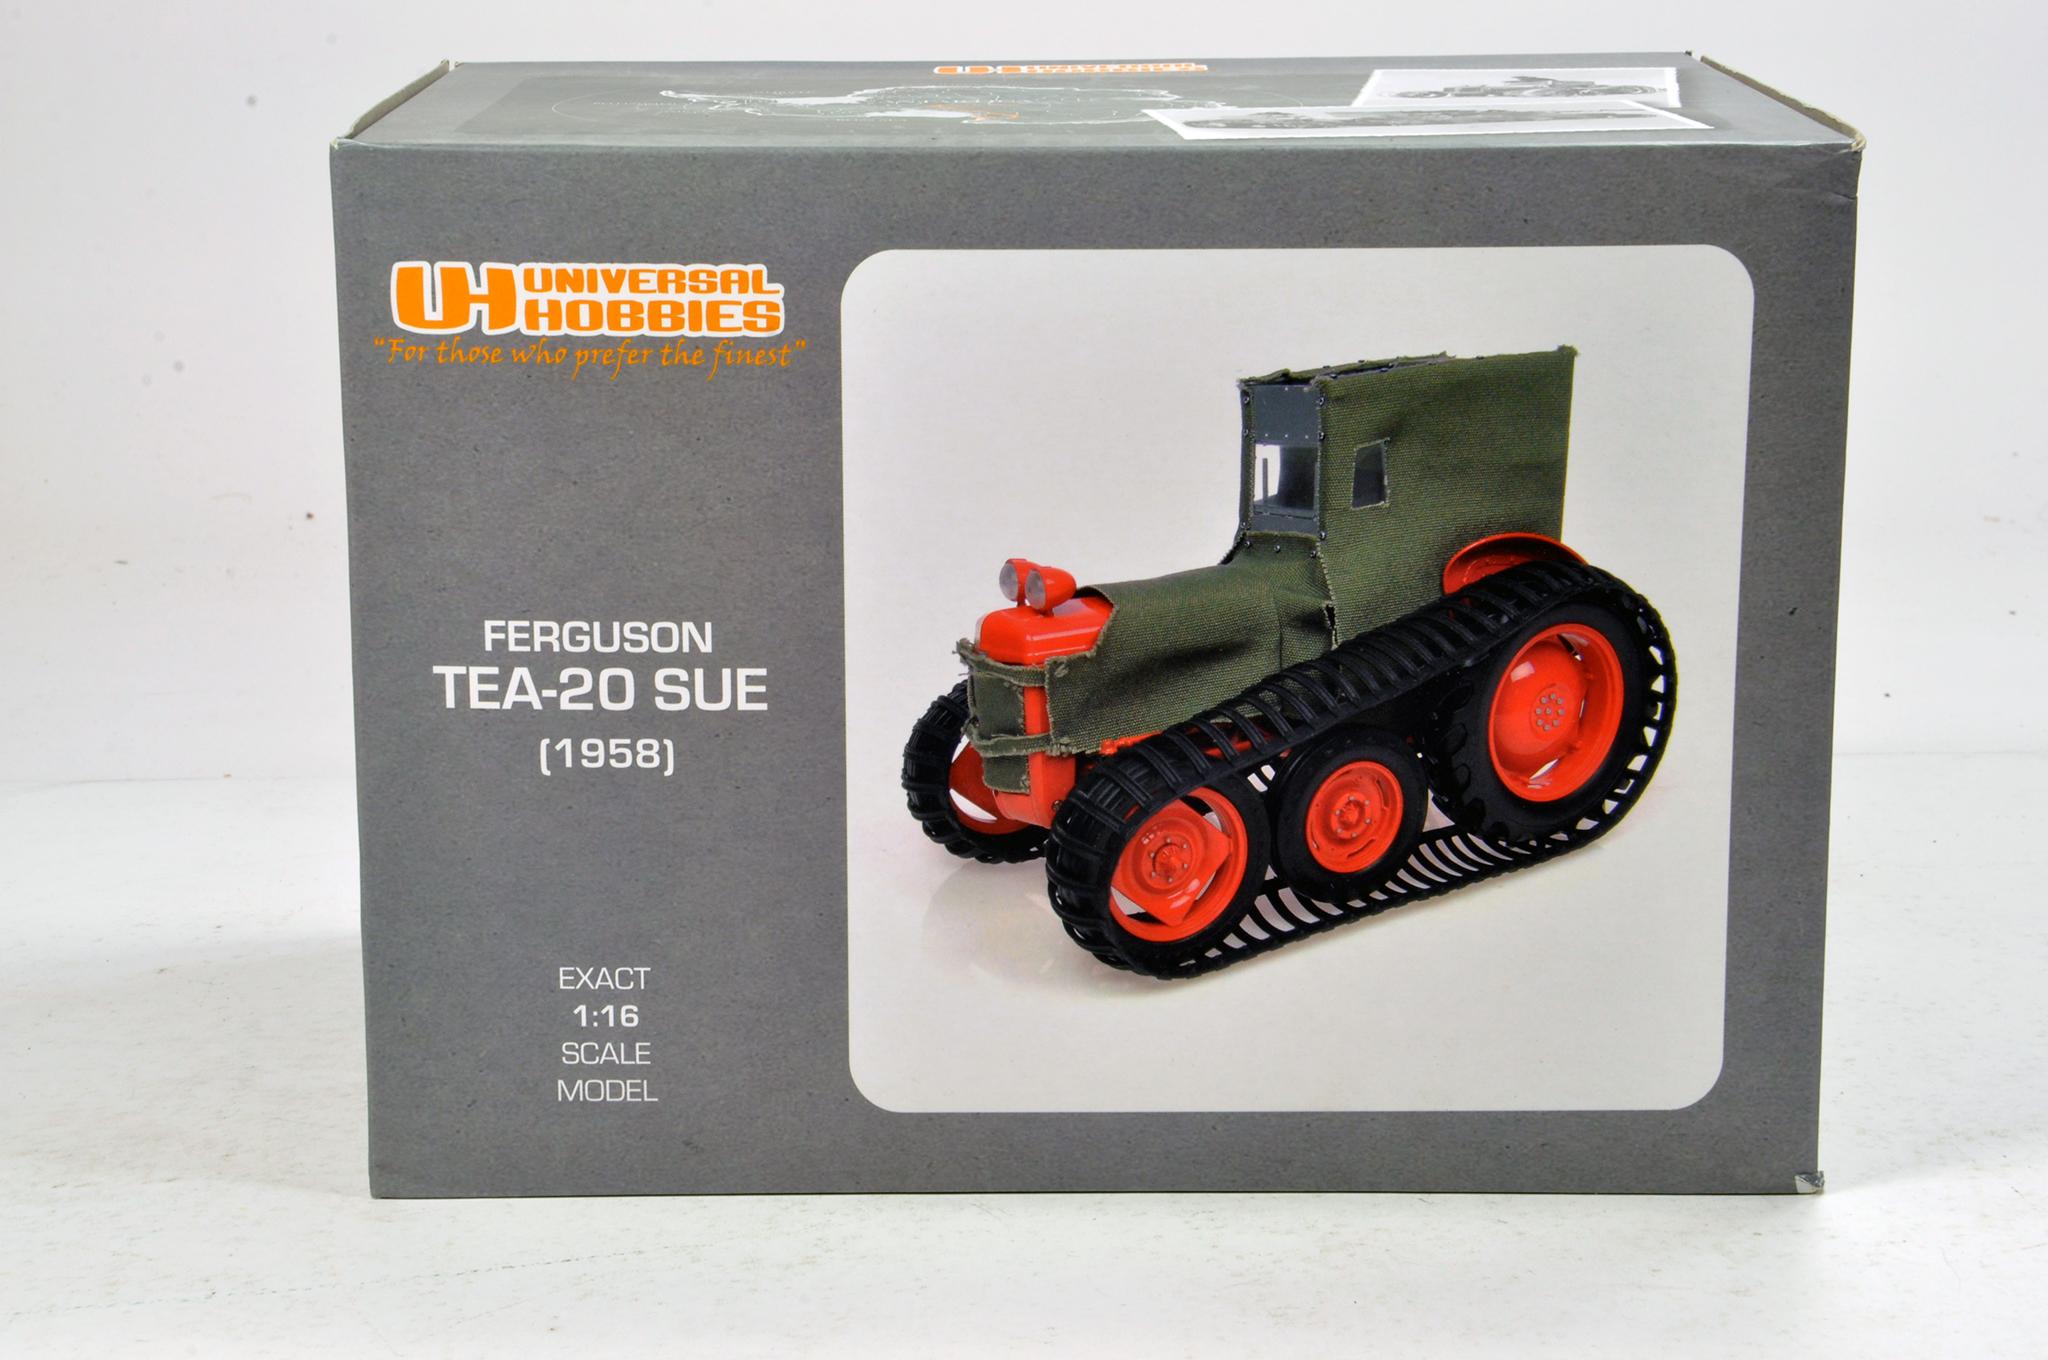 Lot 978 - Universal Hobbies 1/16 Ferguson TEA20 Sue Tractor. NM in Box.